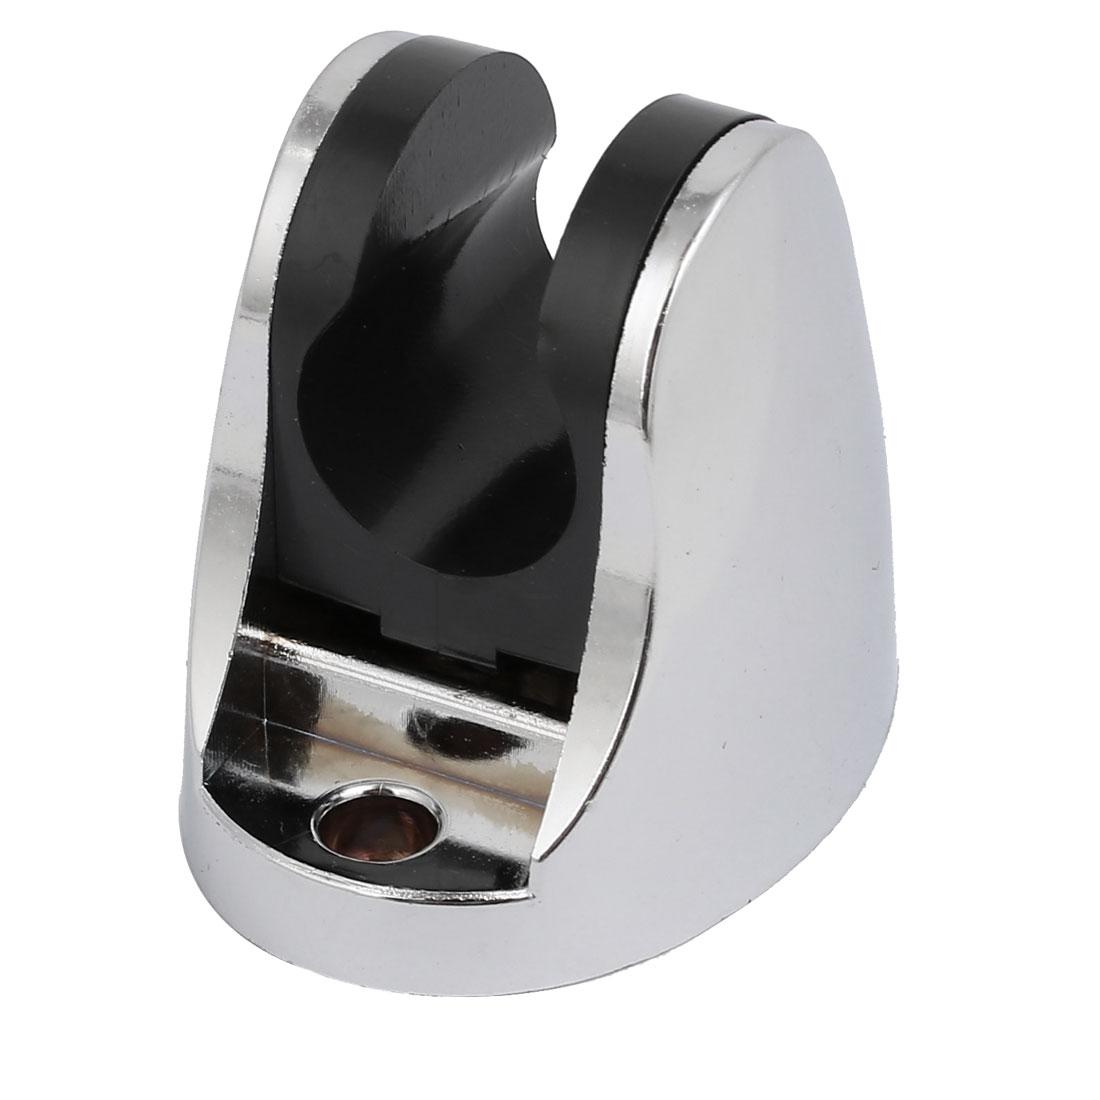 Aluminum Adjustable Wall Mount Bracket Shower Accessory Silver Tone